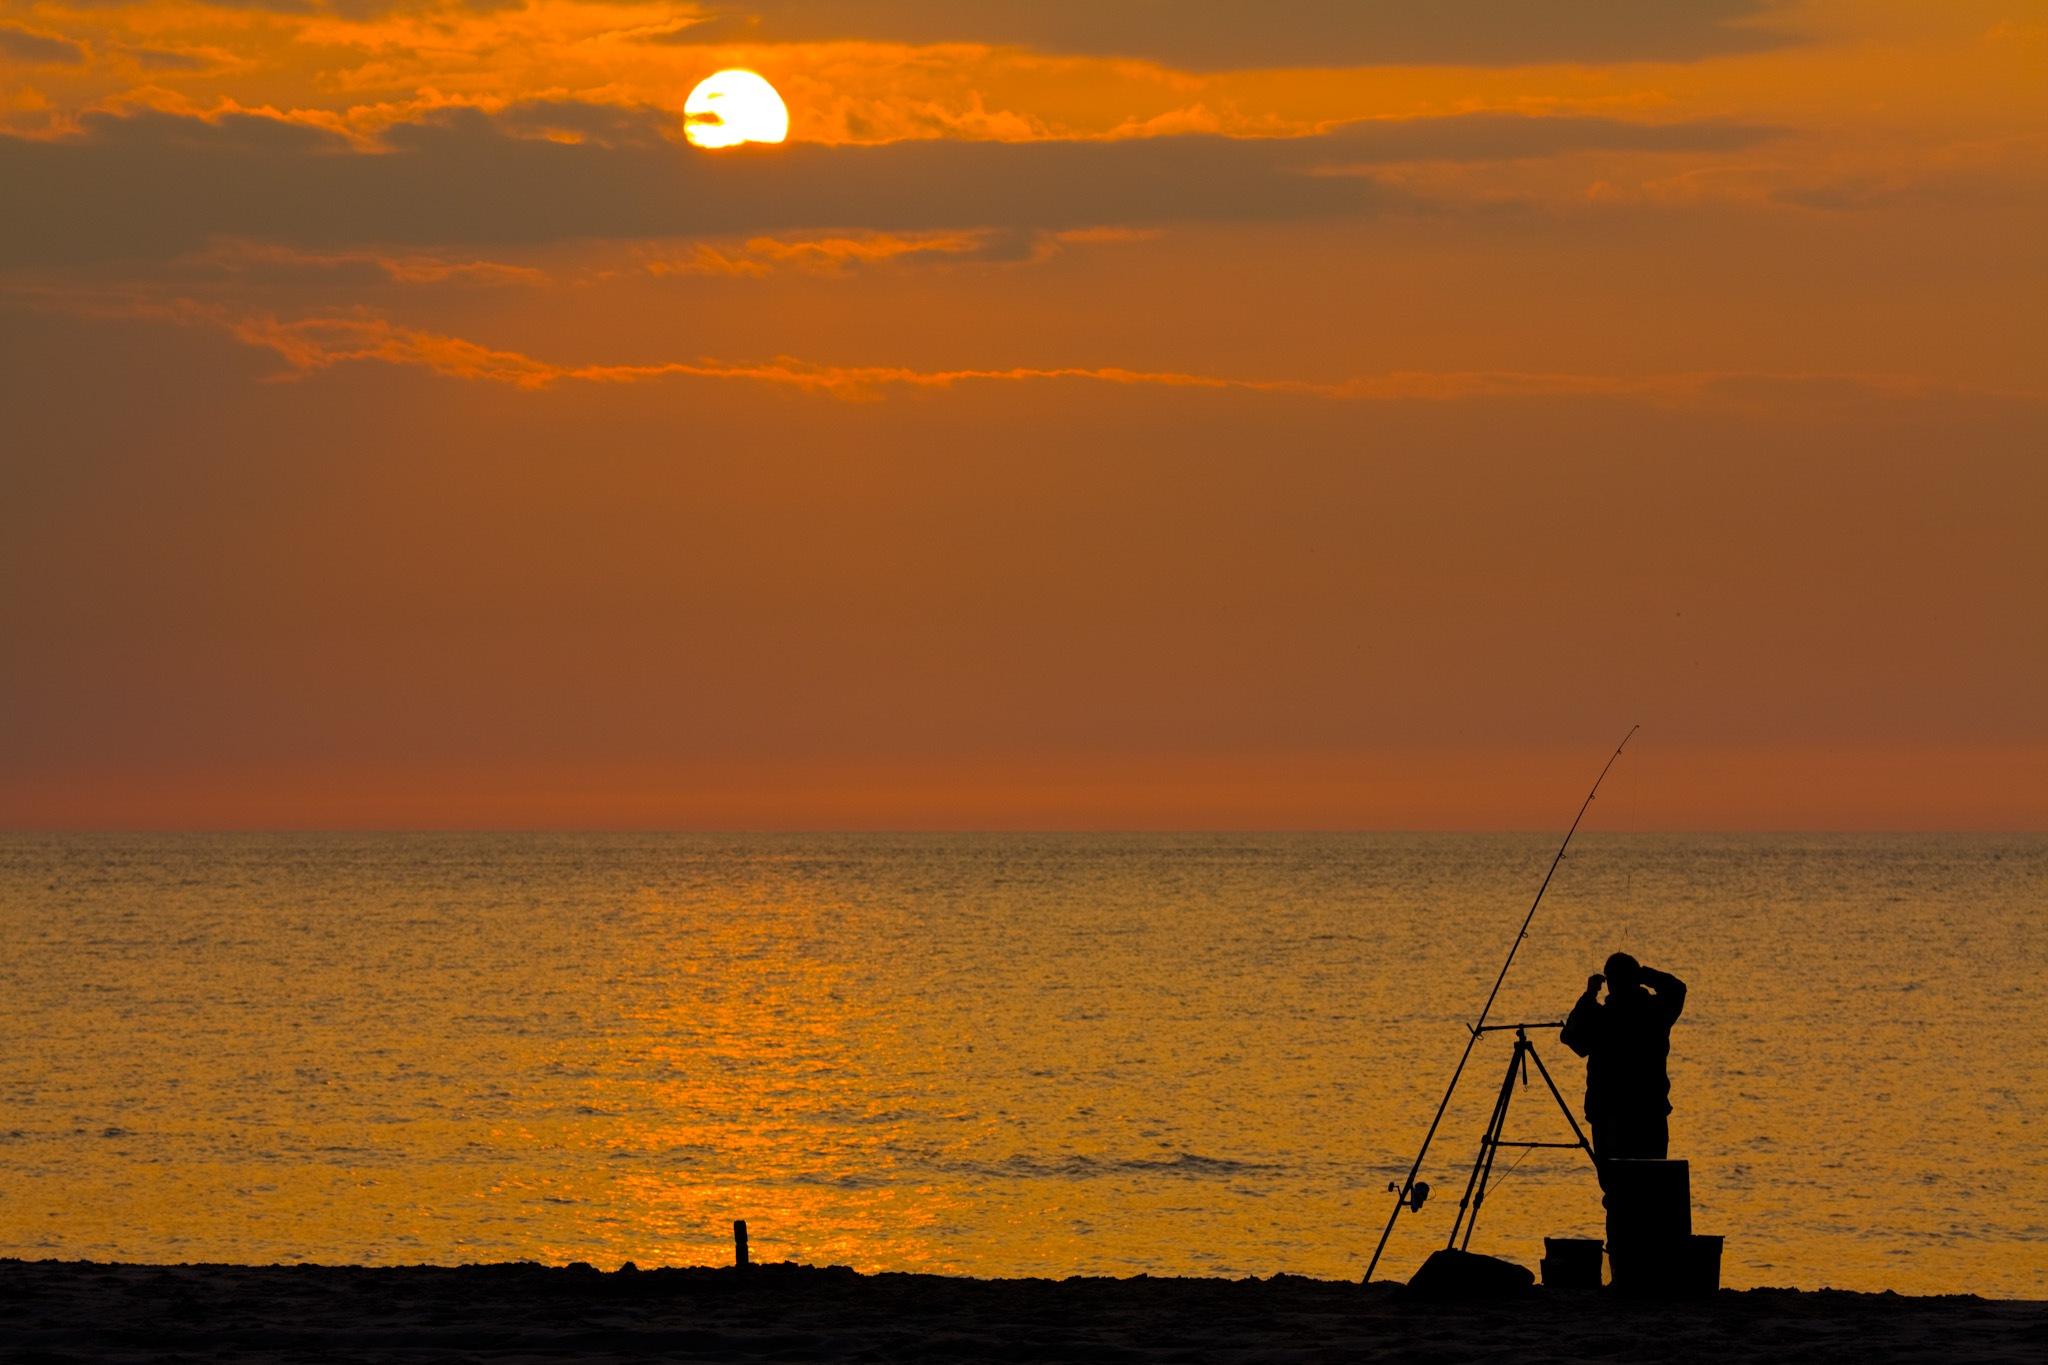 Sunset fishing by Michel van Nederveen